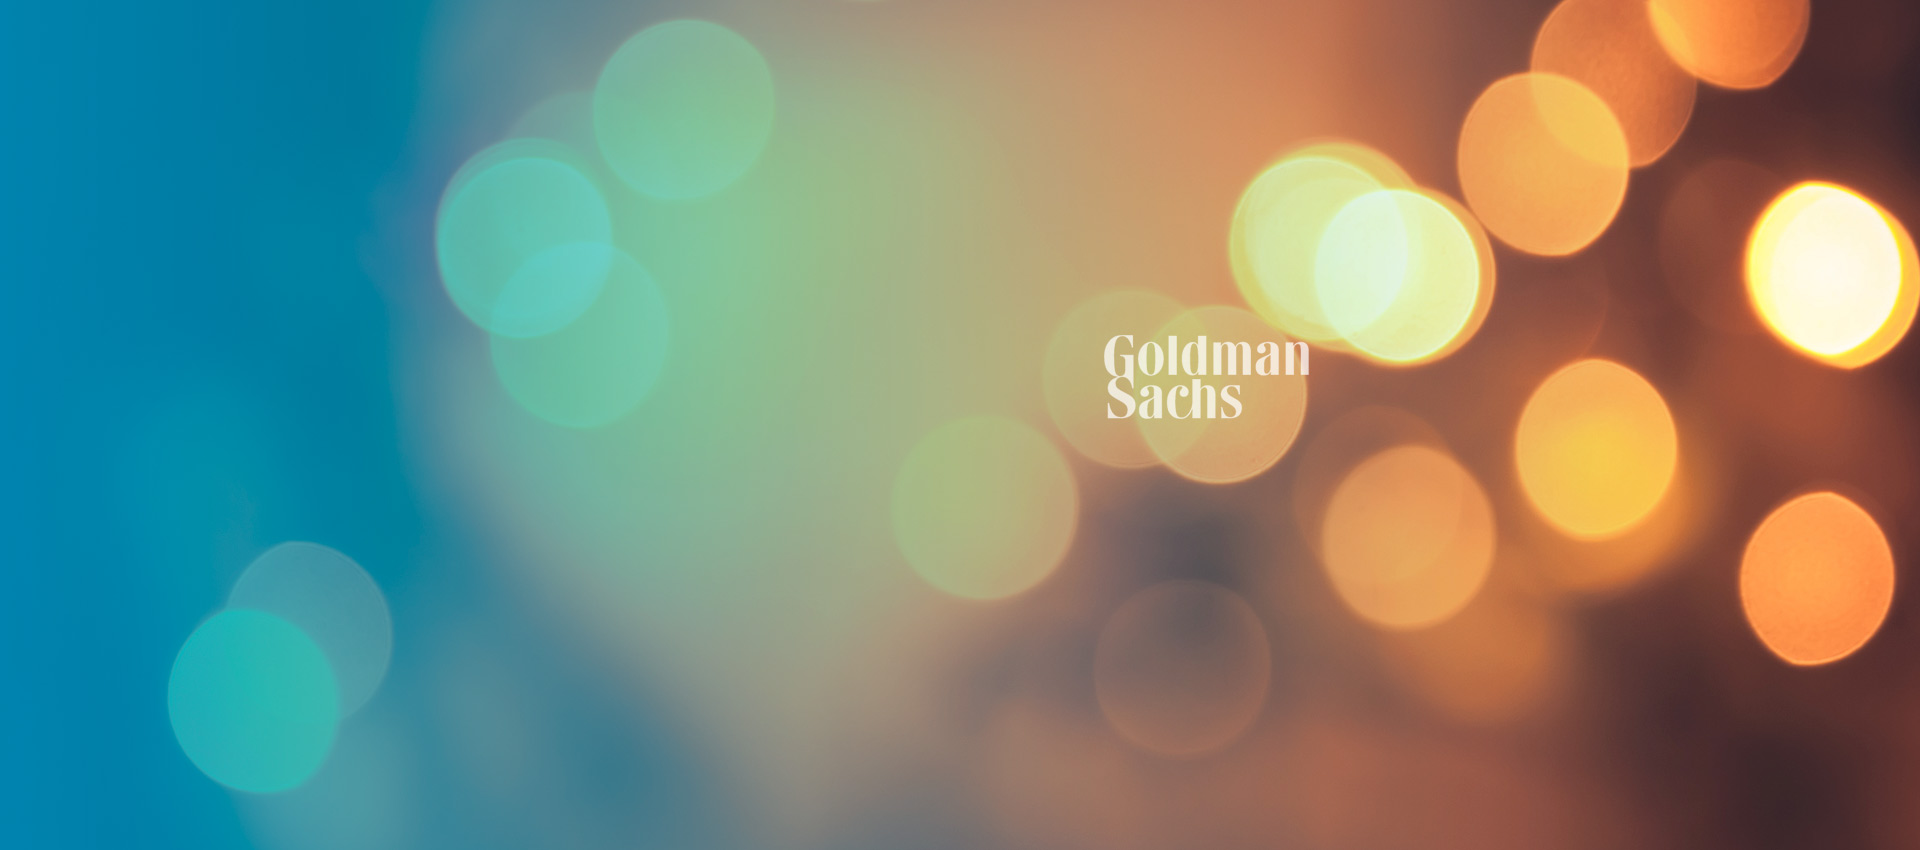 "C3 - Goldman Sachs ""Most Intriguing Entrepreneur"" Award 2018"